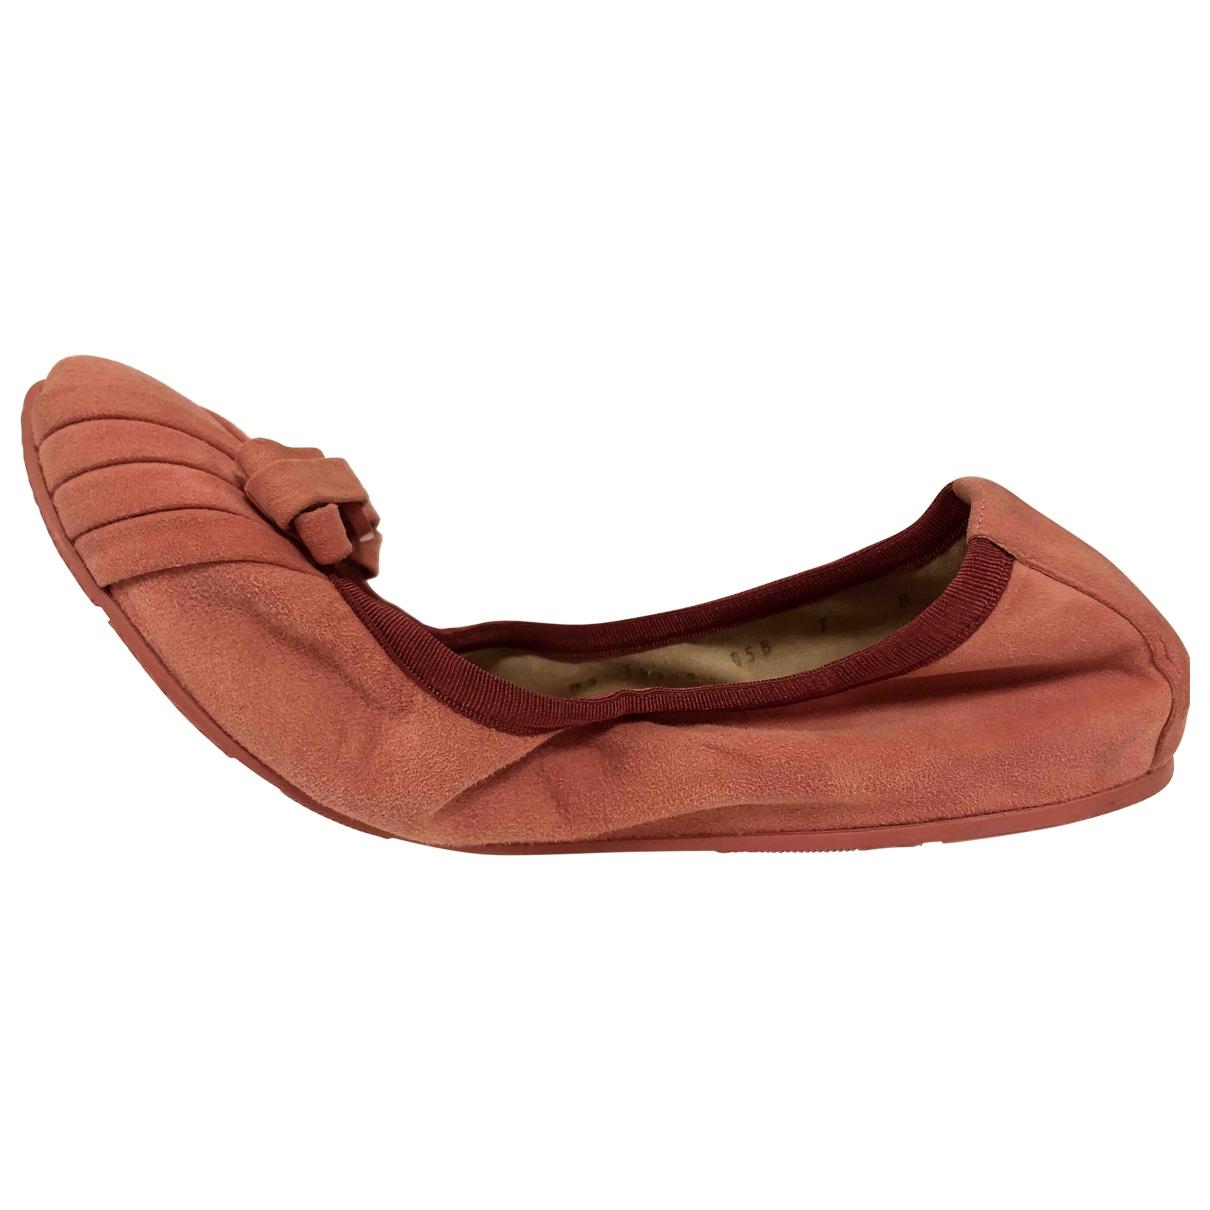 Salvatore Ferragamo \N Pink Suede Flats for Women 7 US